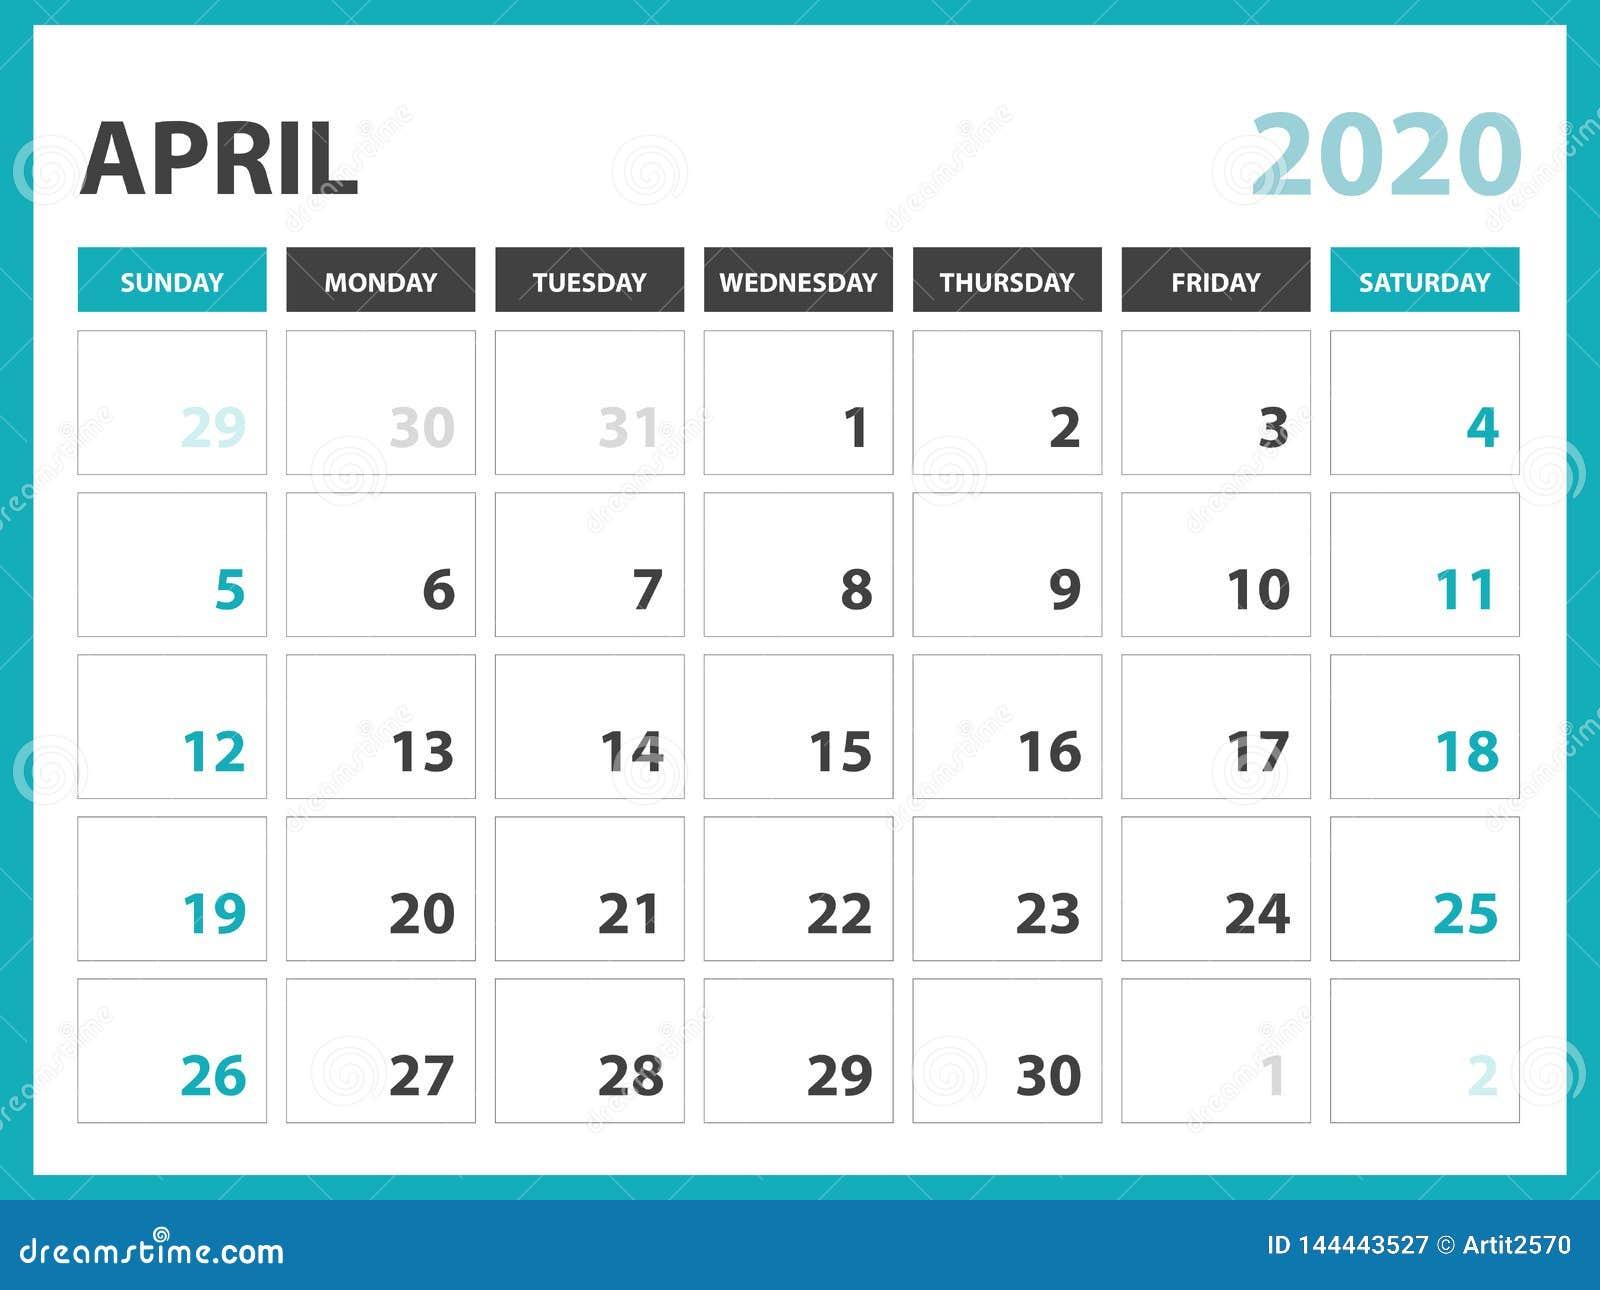 Desk Calendar Layout Size 8 X 6 Inch, April 2020 Calendar